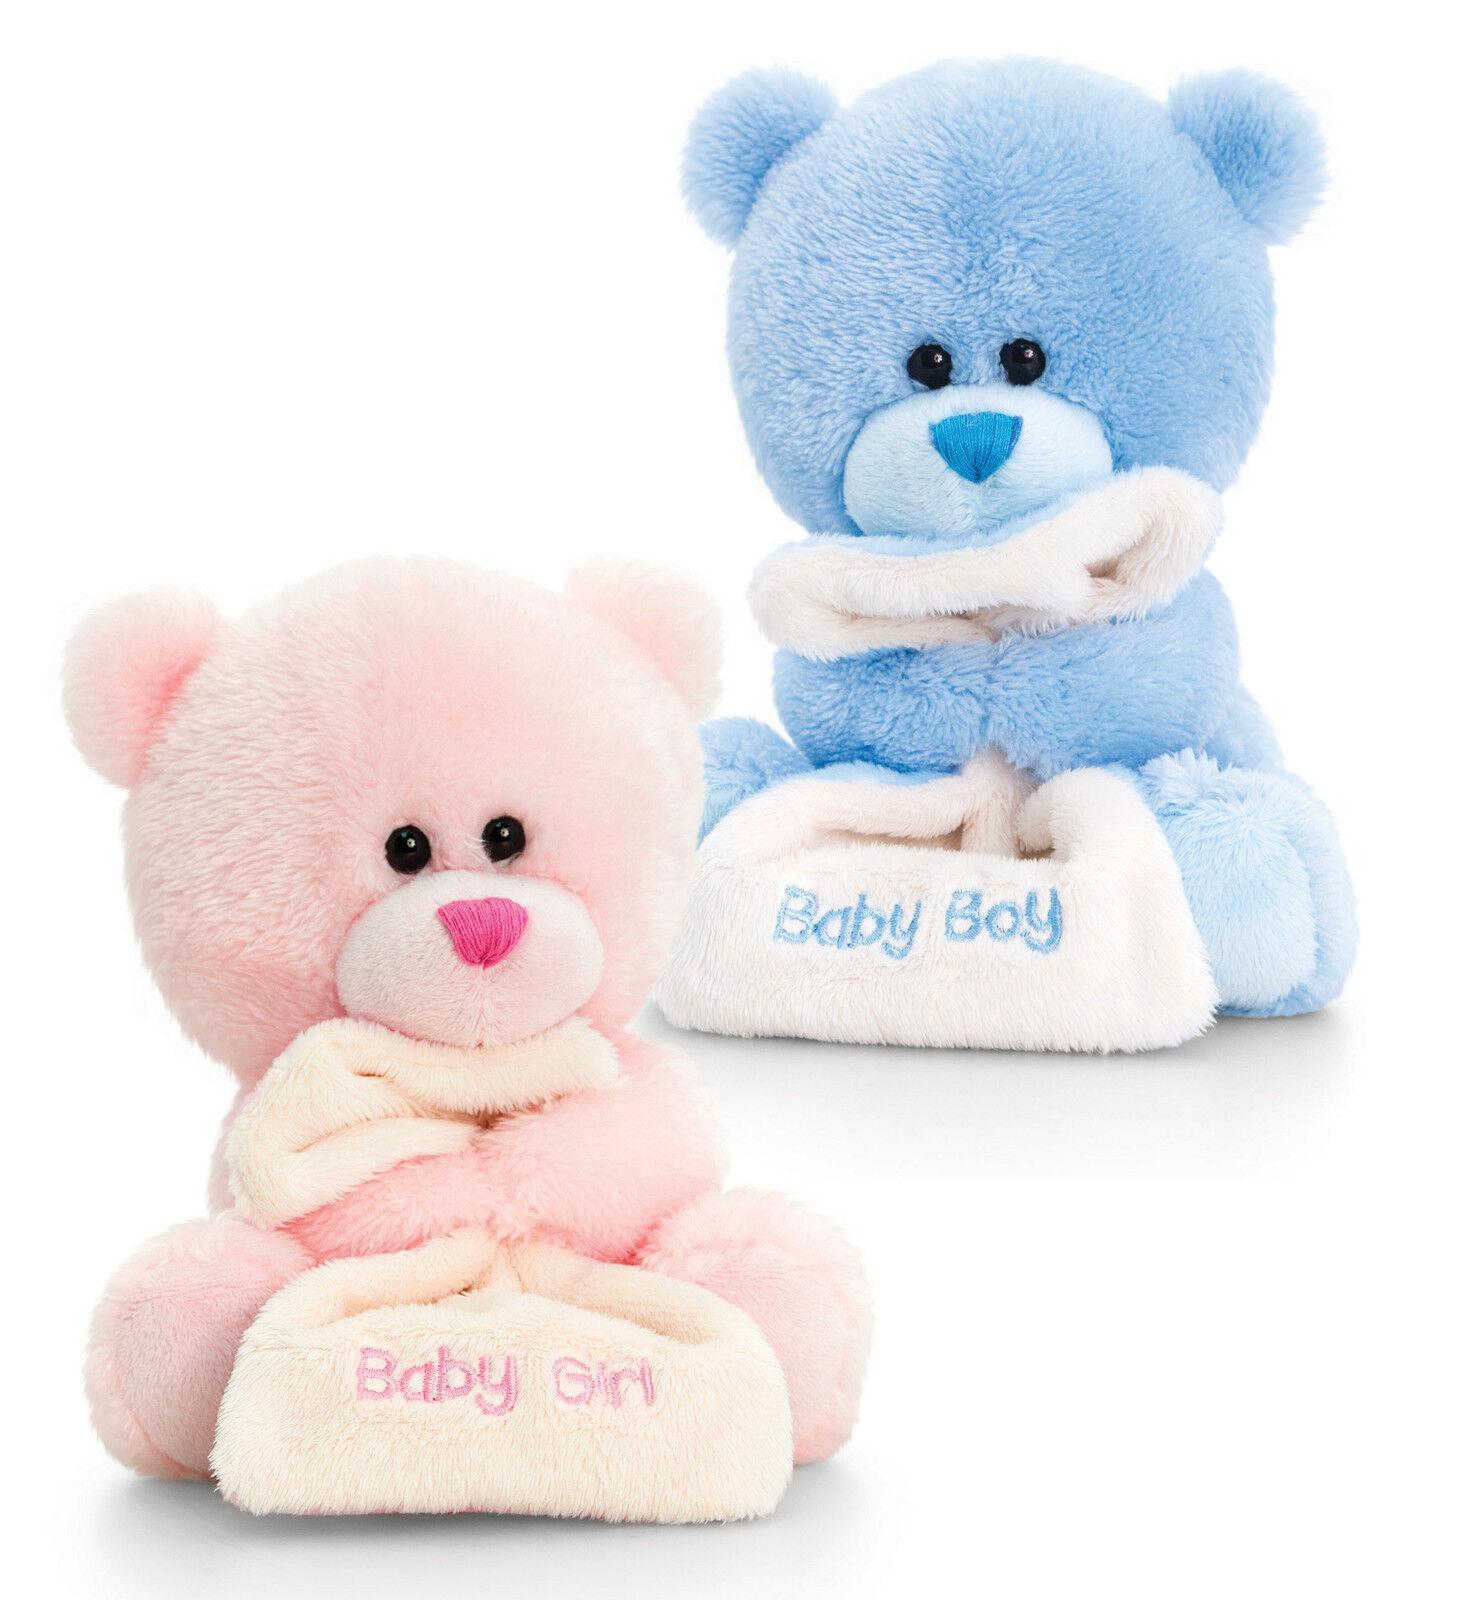 Plüschtier Teddy Bär Kuscheltier Baby Boy & Girl Stofftier Pipp